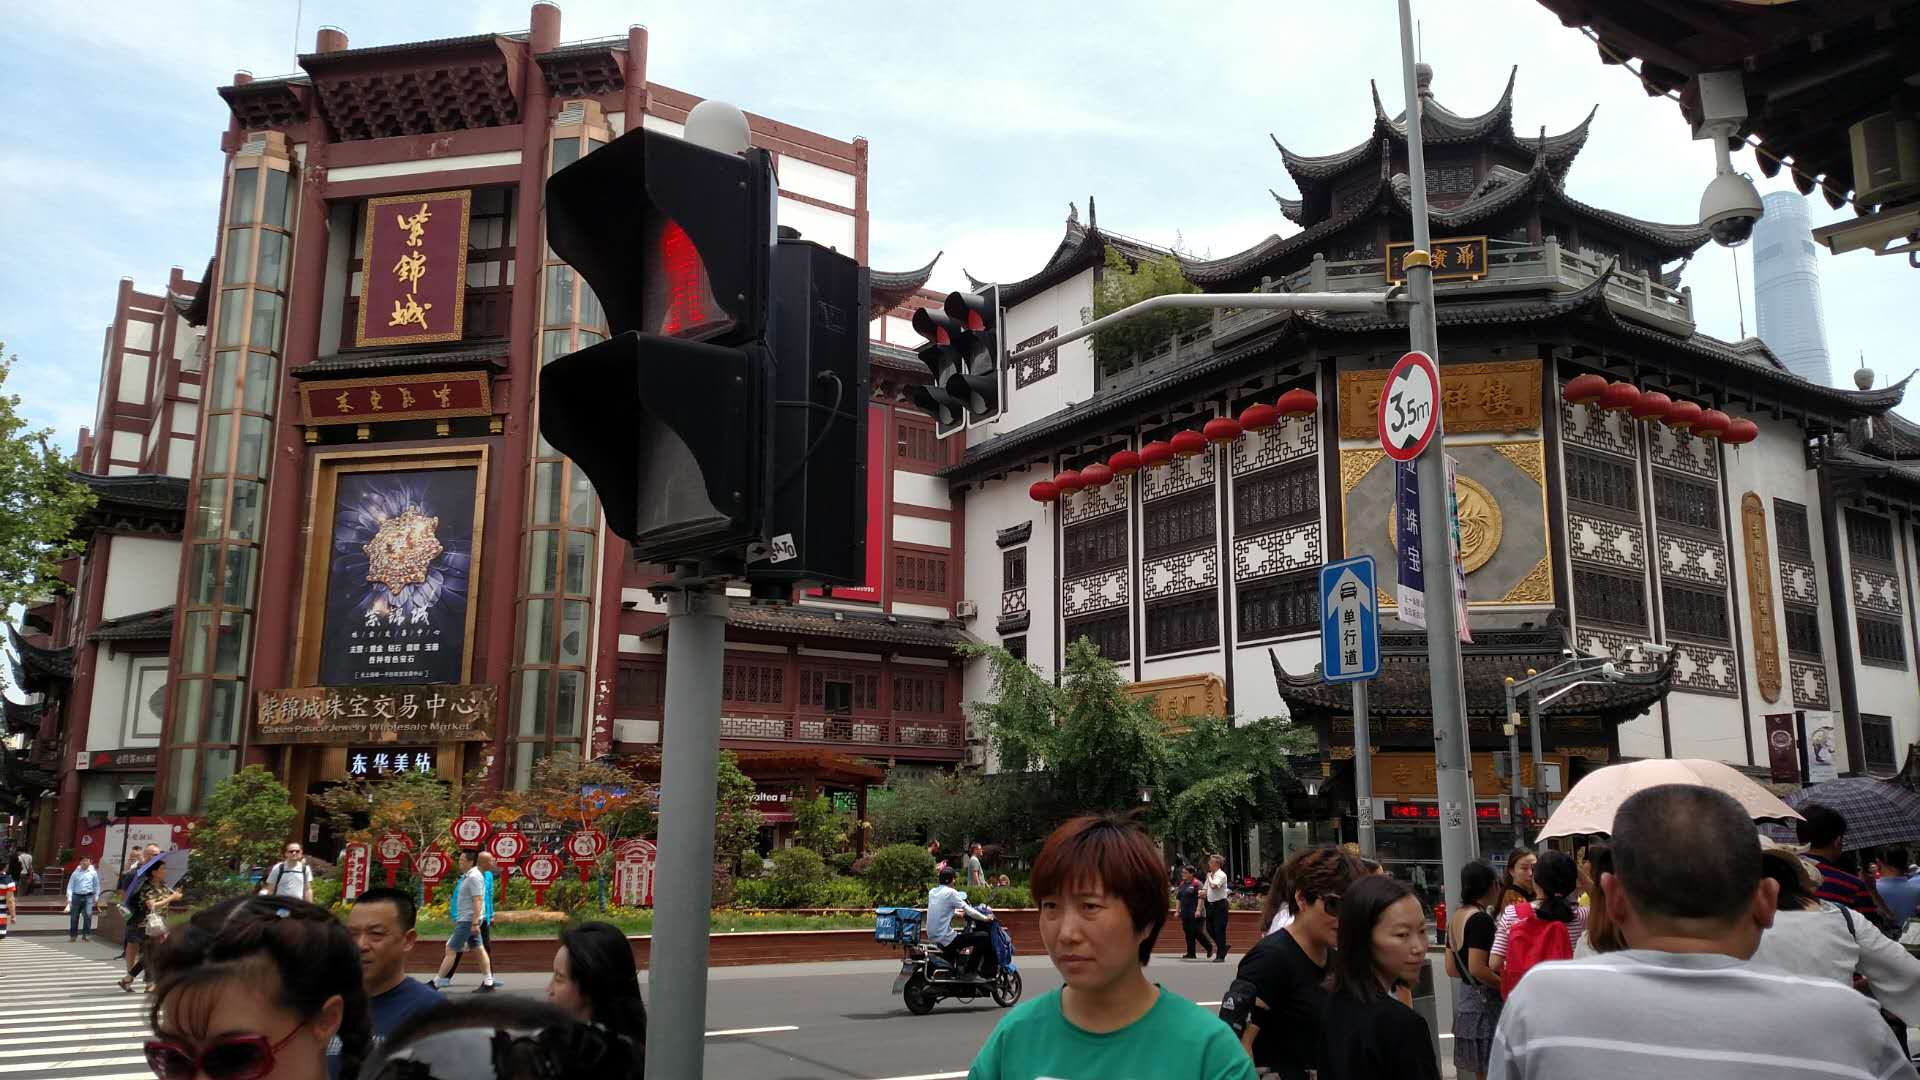 CAPAStudyAbroad_Shanghai_Summer2018_From Trisha Sanchez - Streets of Shanghai